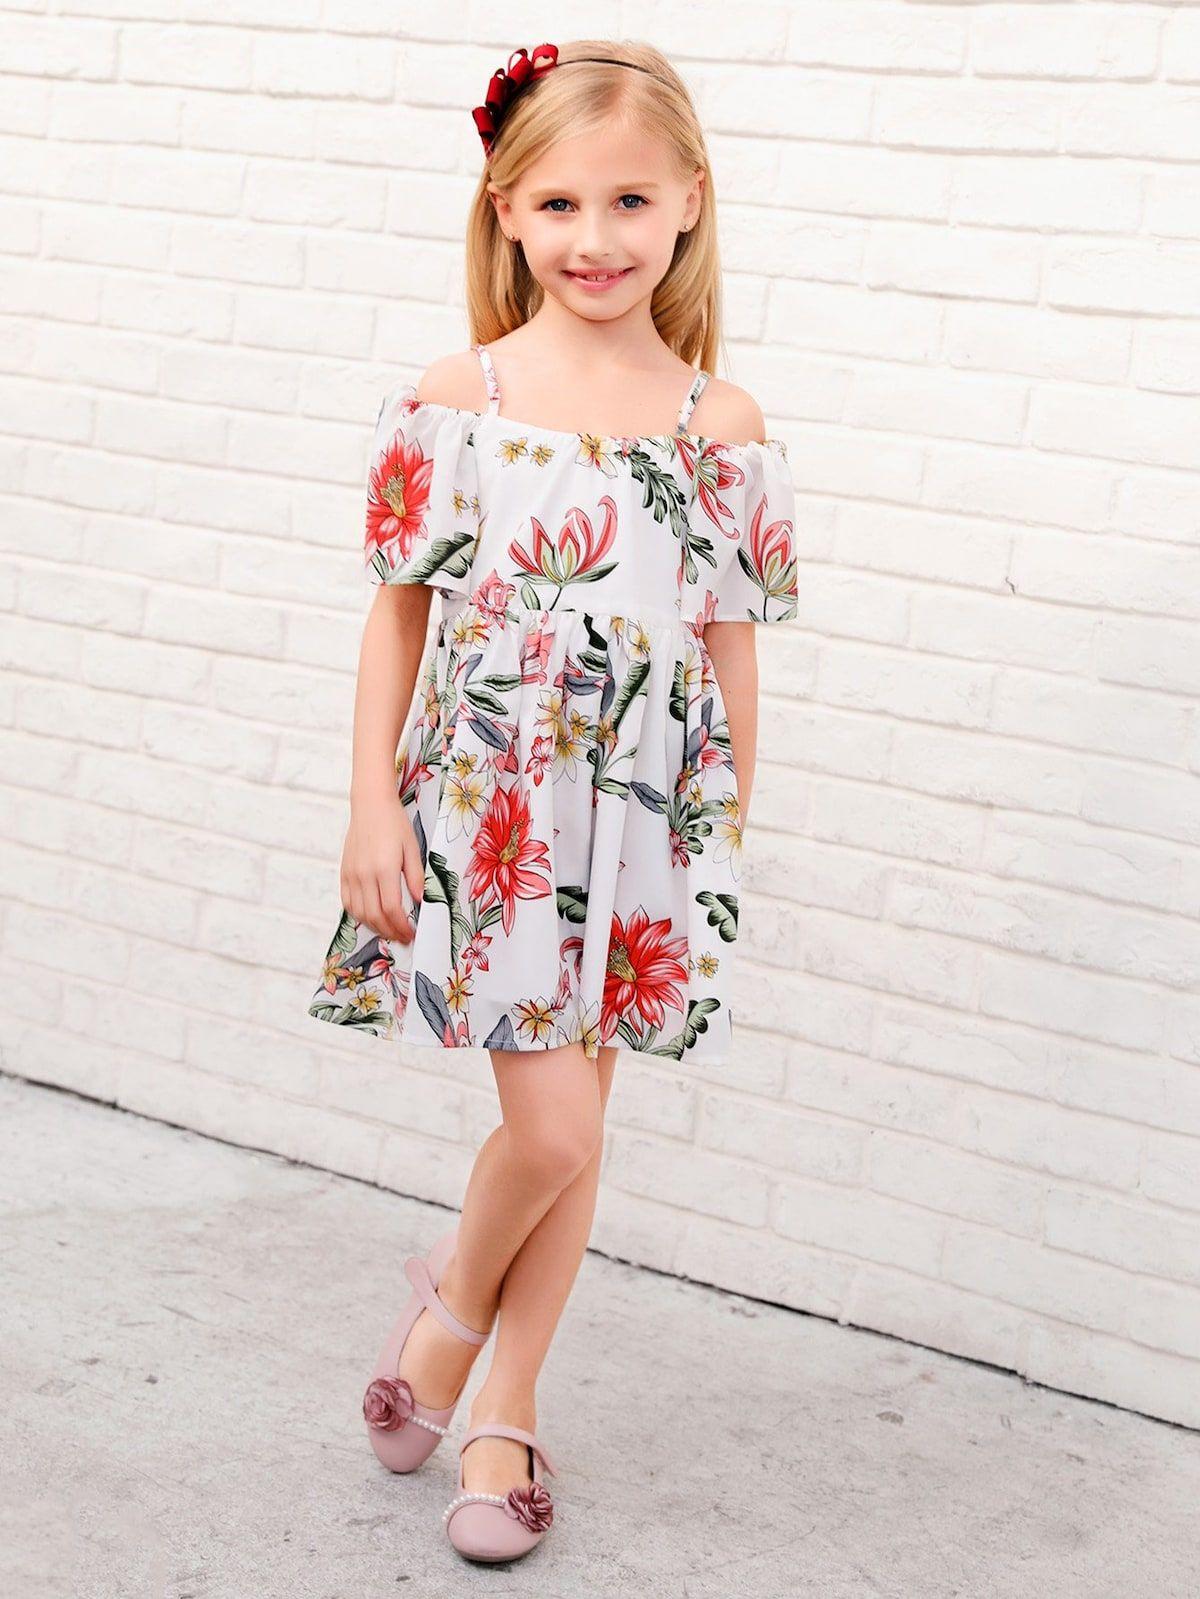 f546b57833a6 BUY 1 GET 1 99% OFF Toddler Girls Floral Print Cami Dress | Kids Outfit |  Girls Fashion | Toddler Dress | Floral Print Dress